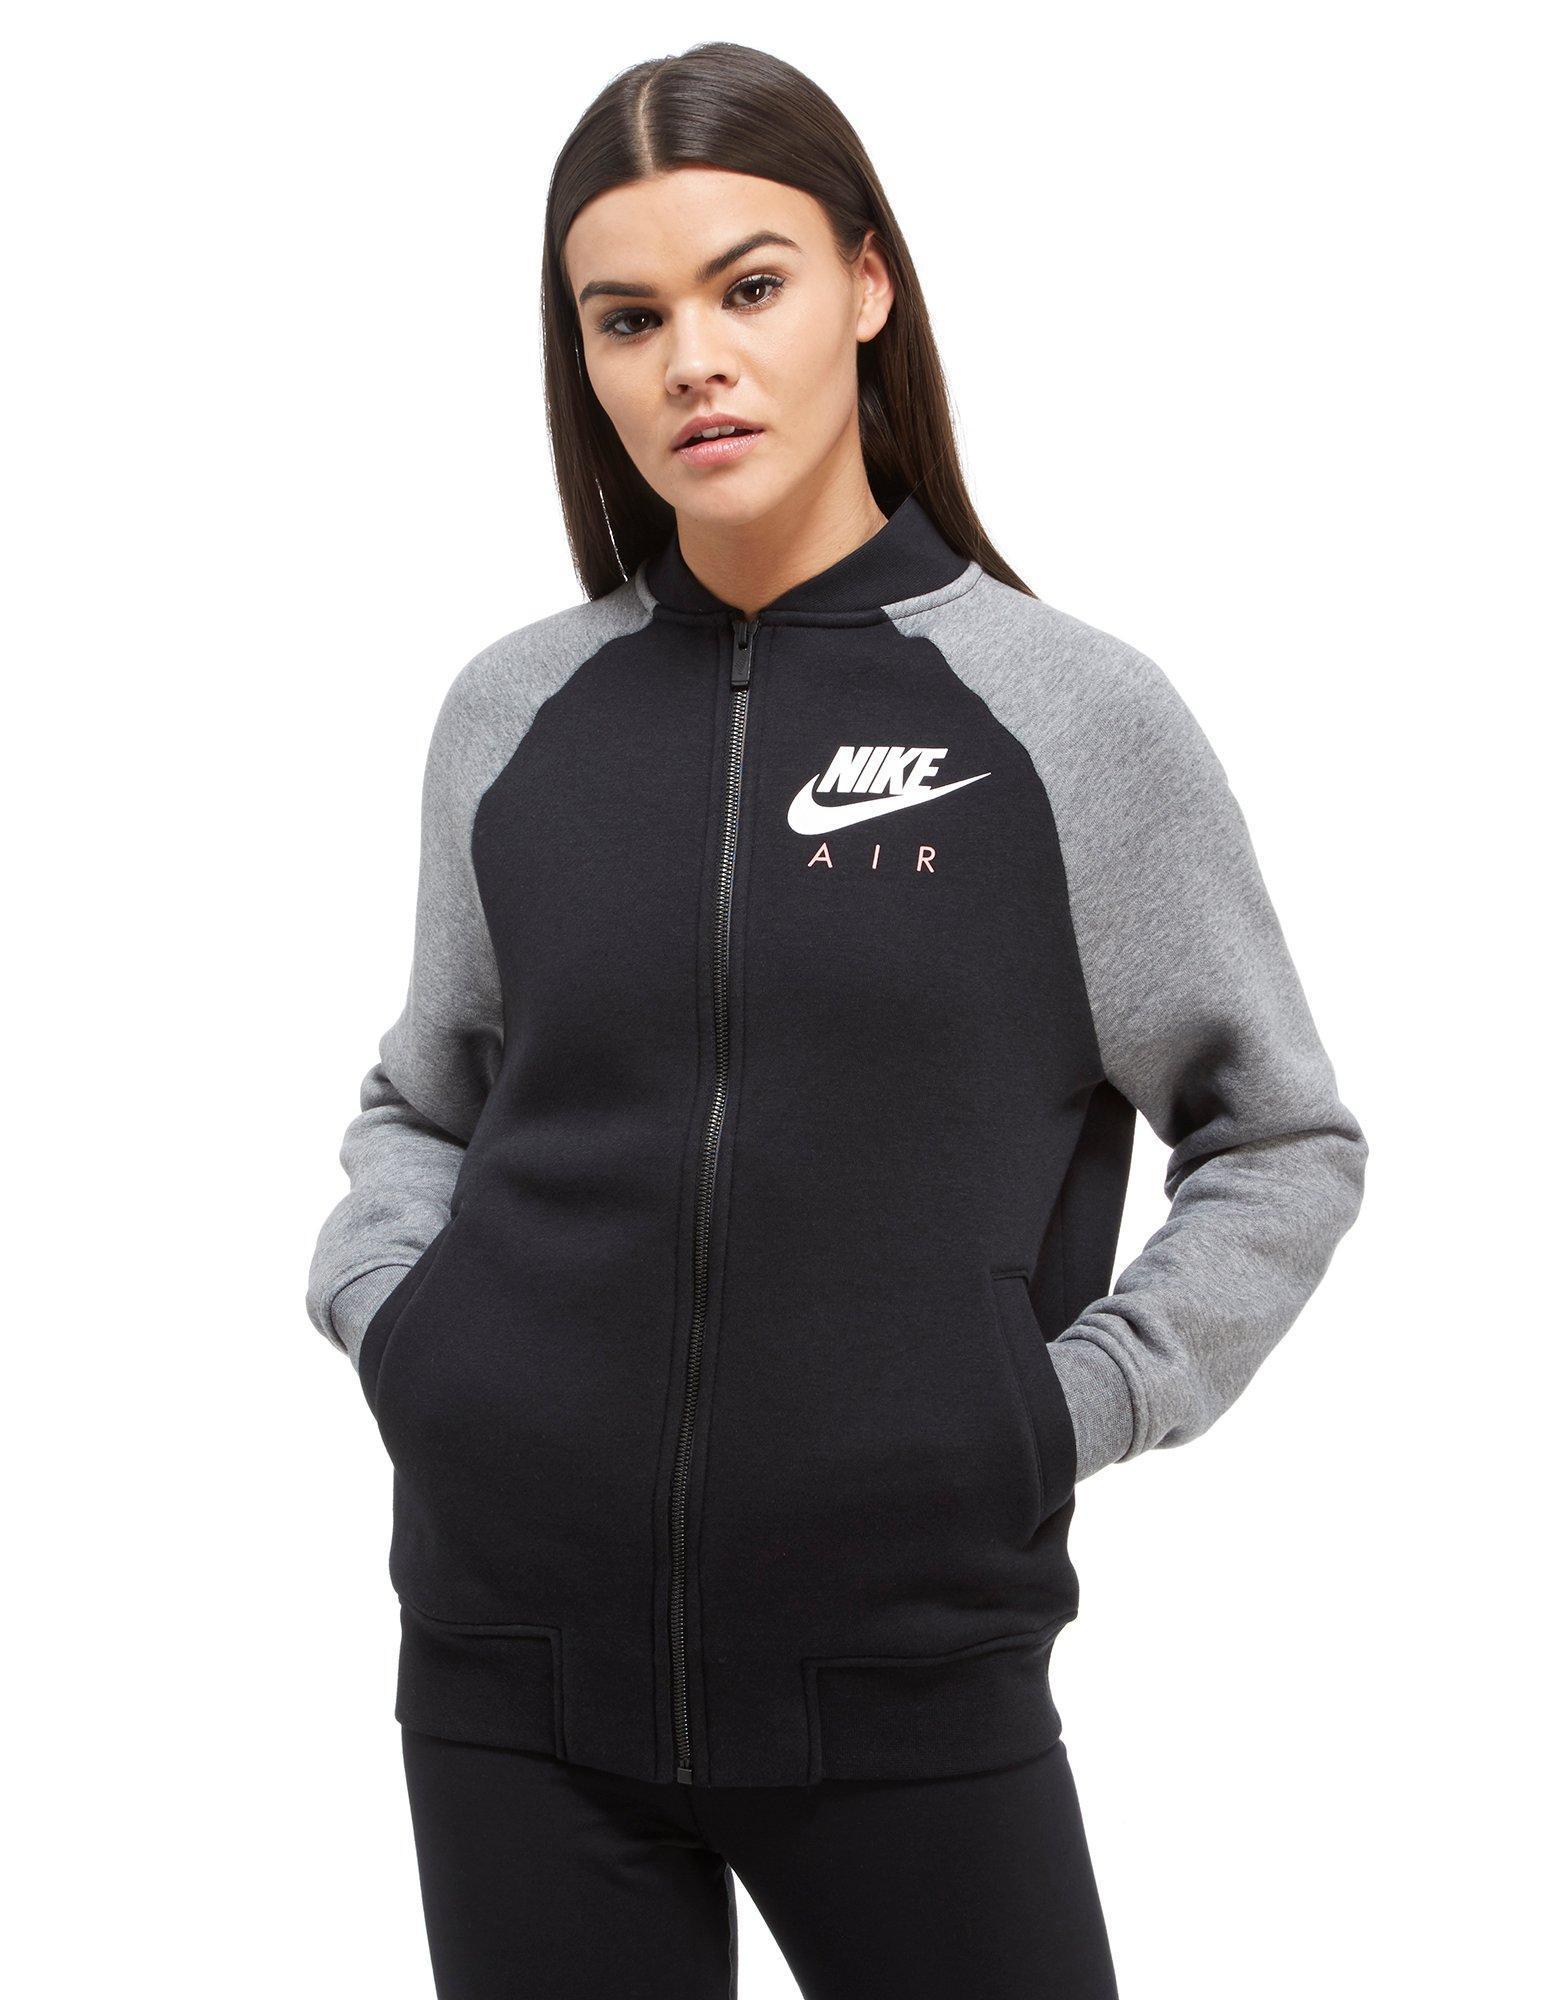 Nike Air Bomber Jacket In Black Lyst